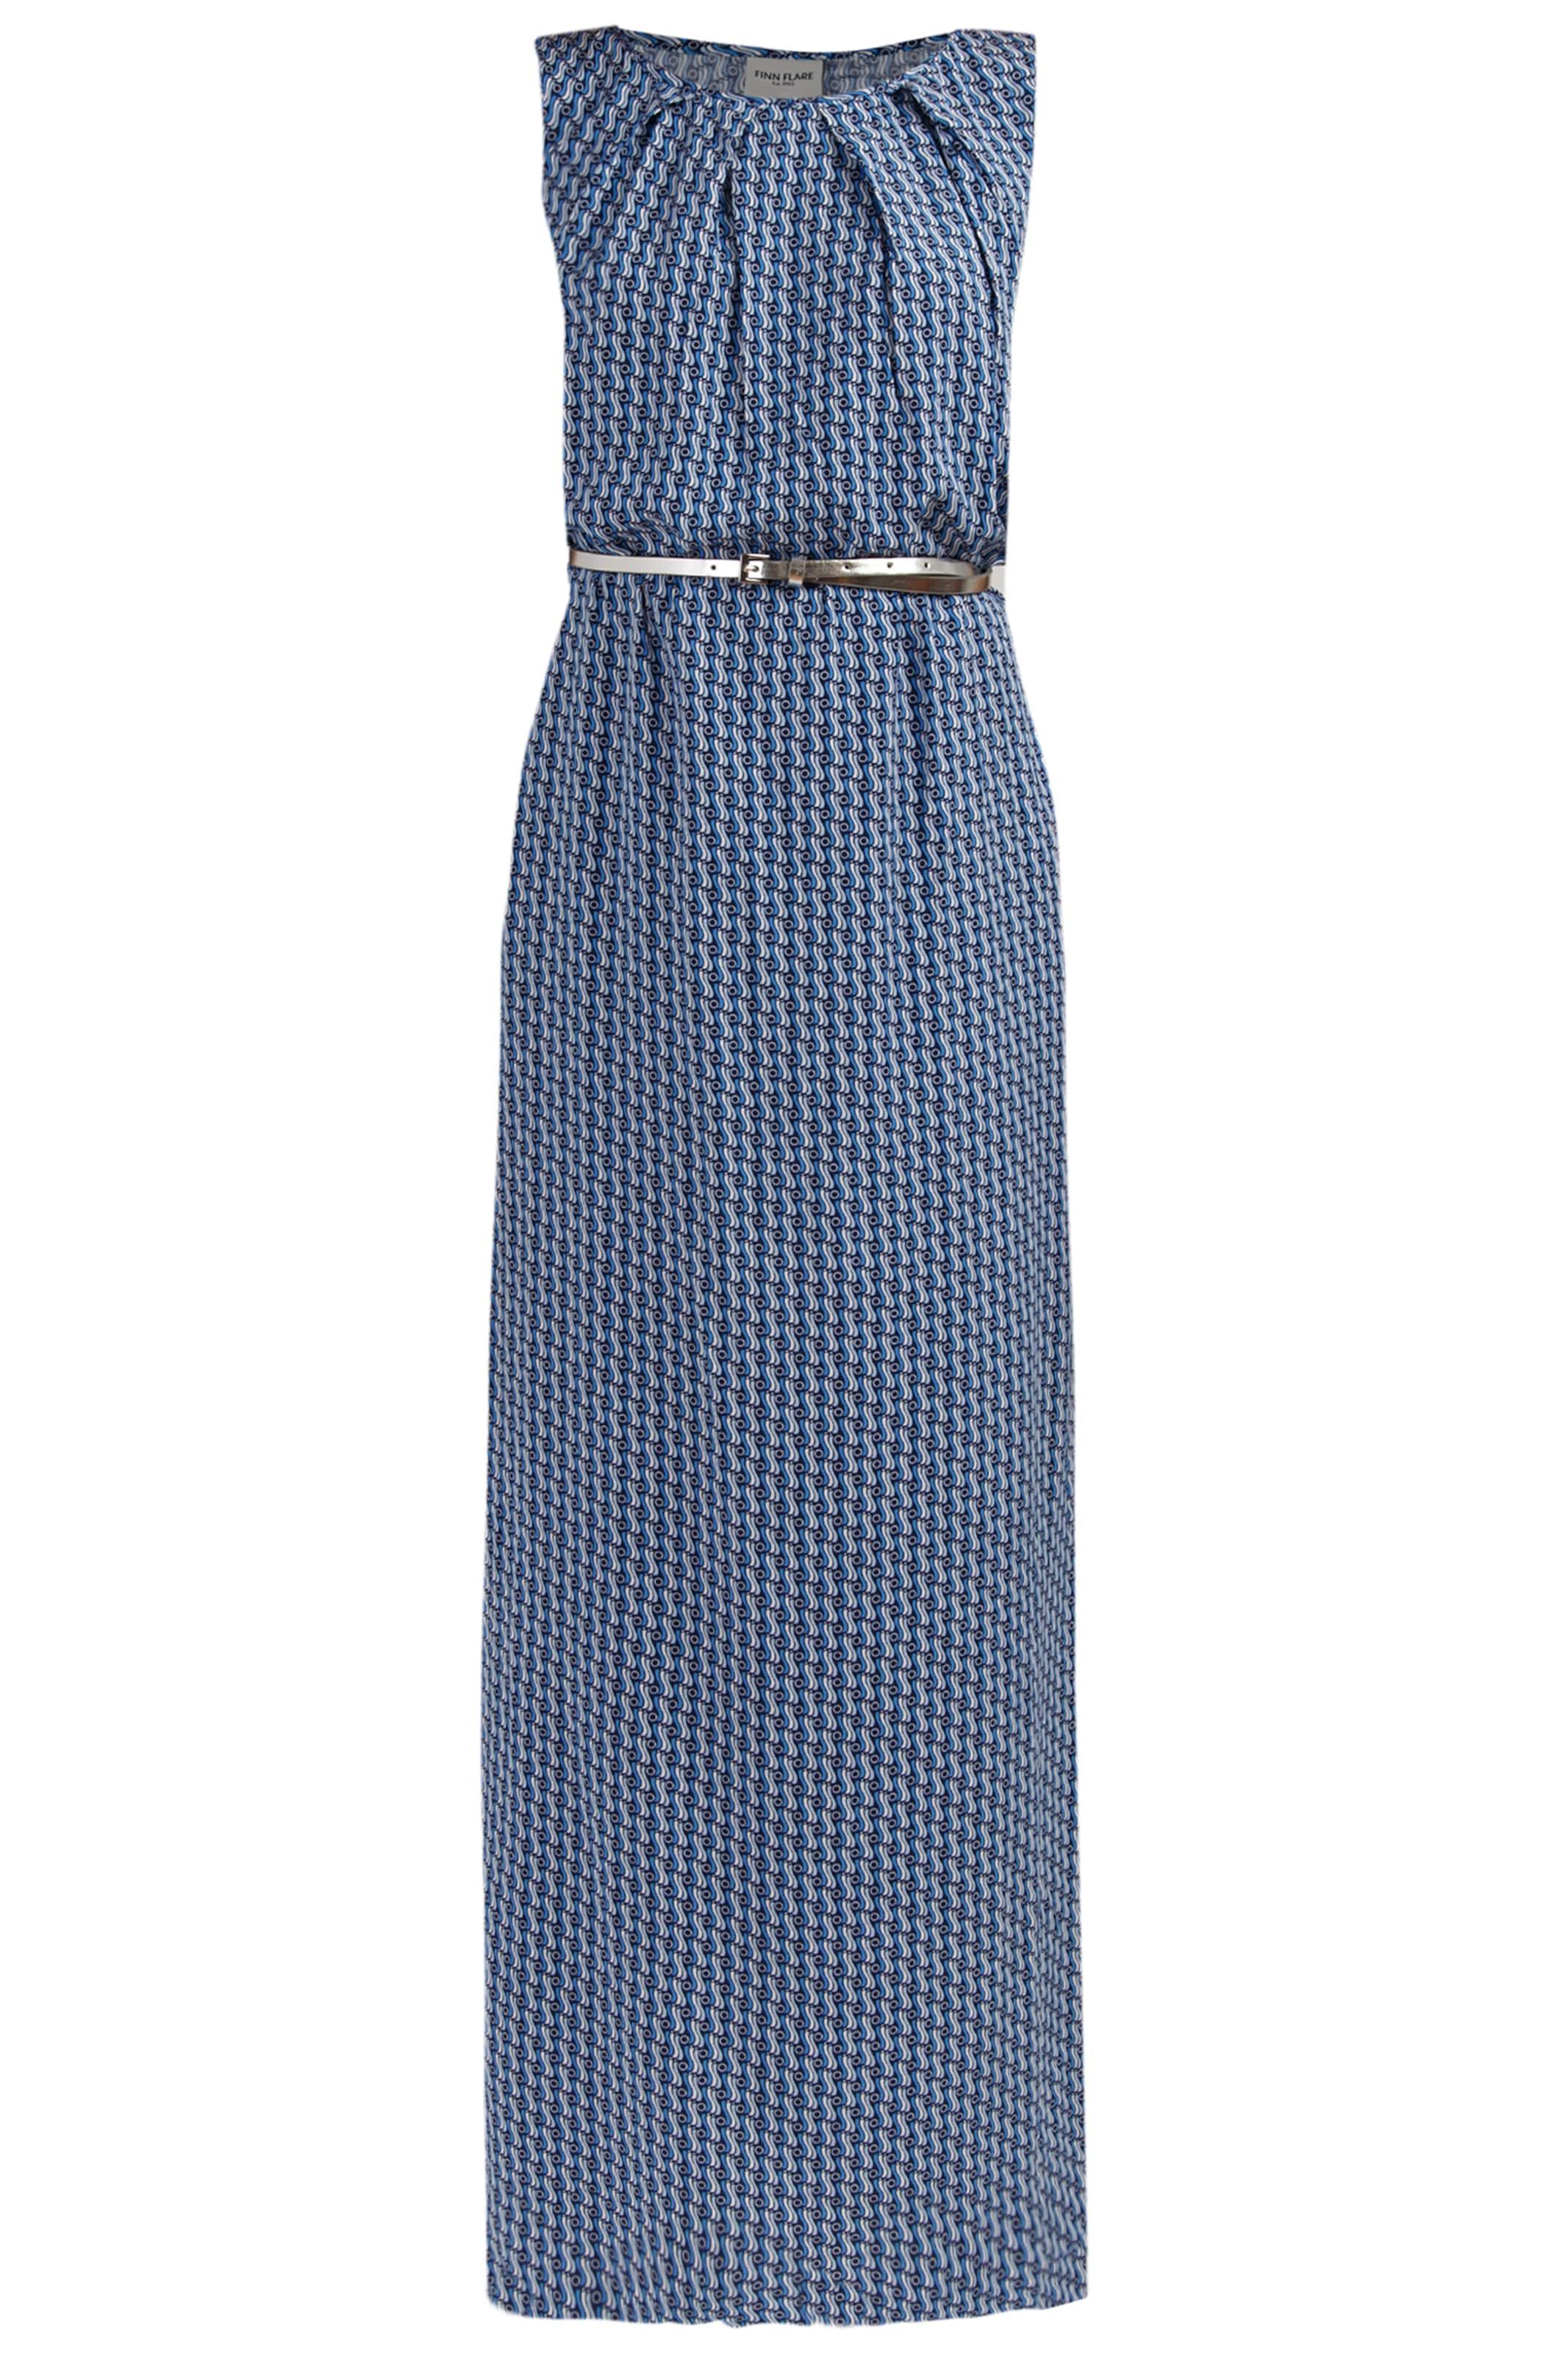 Finn Flare BlauDunkelblau Weiß In Kleid T5ulF31KJc